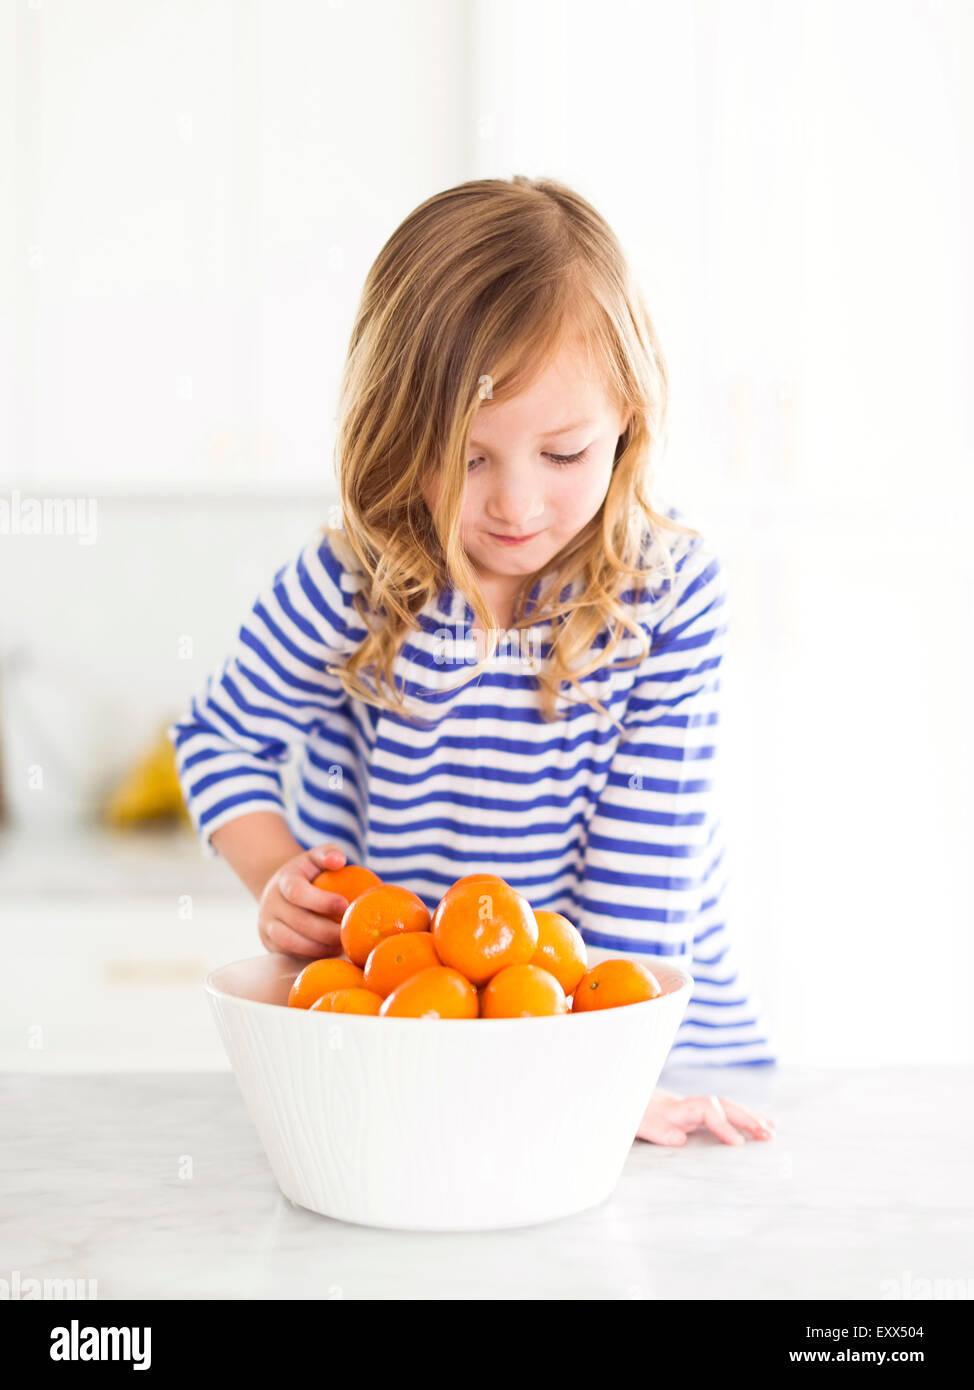 Girl (4-5) looking at oranges, smiling - Stock Image